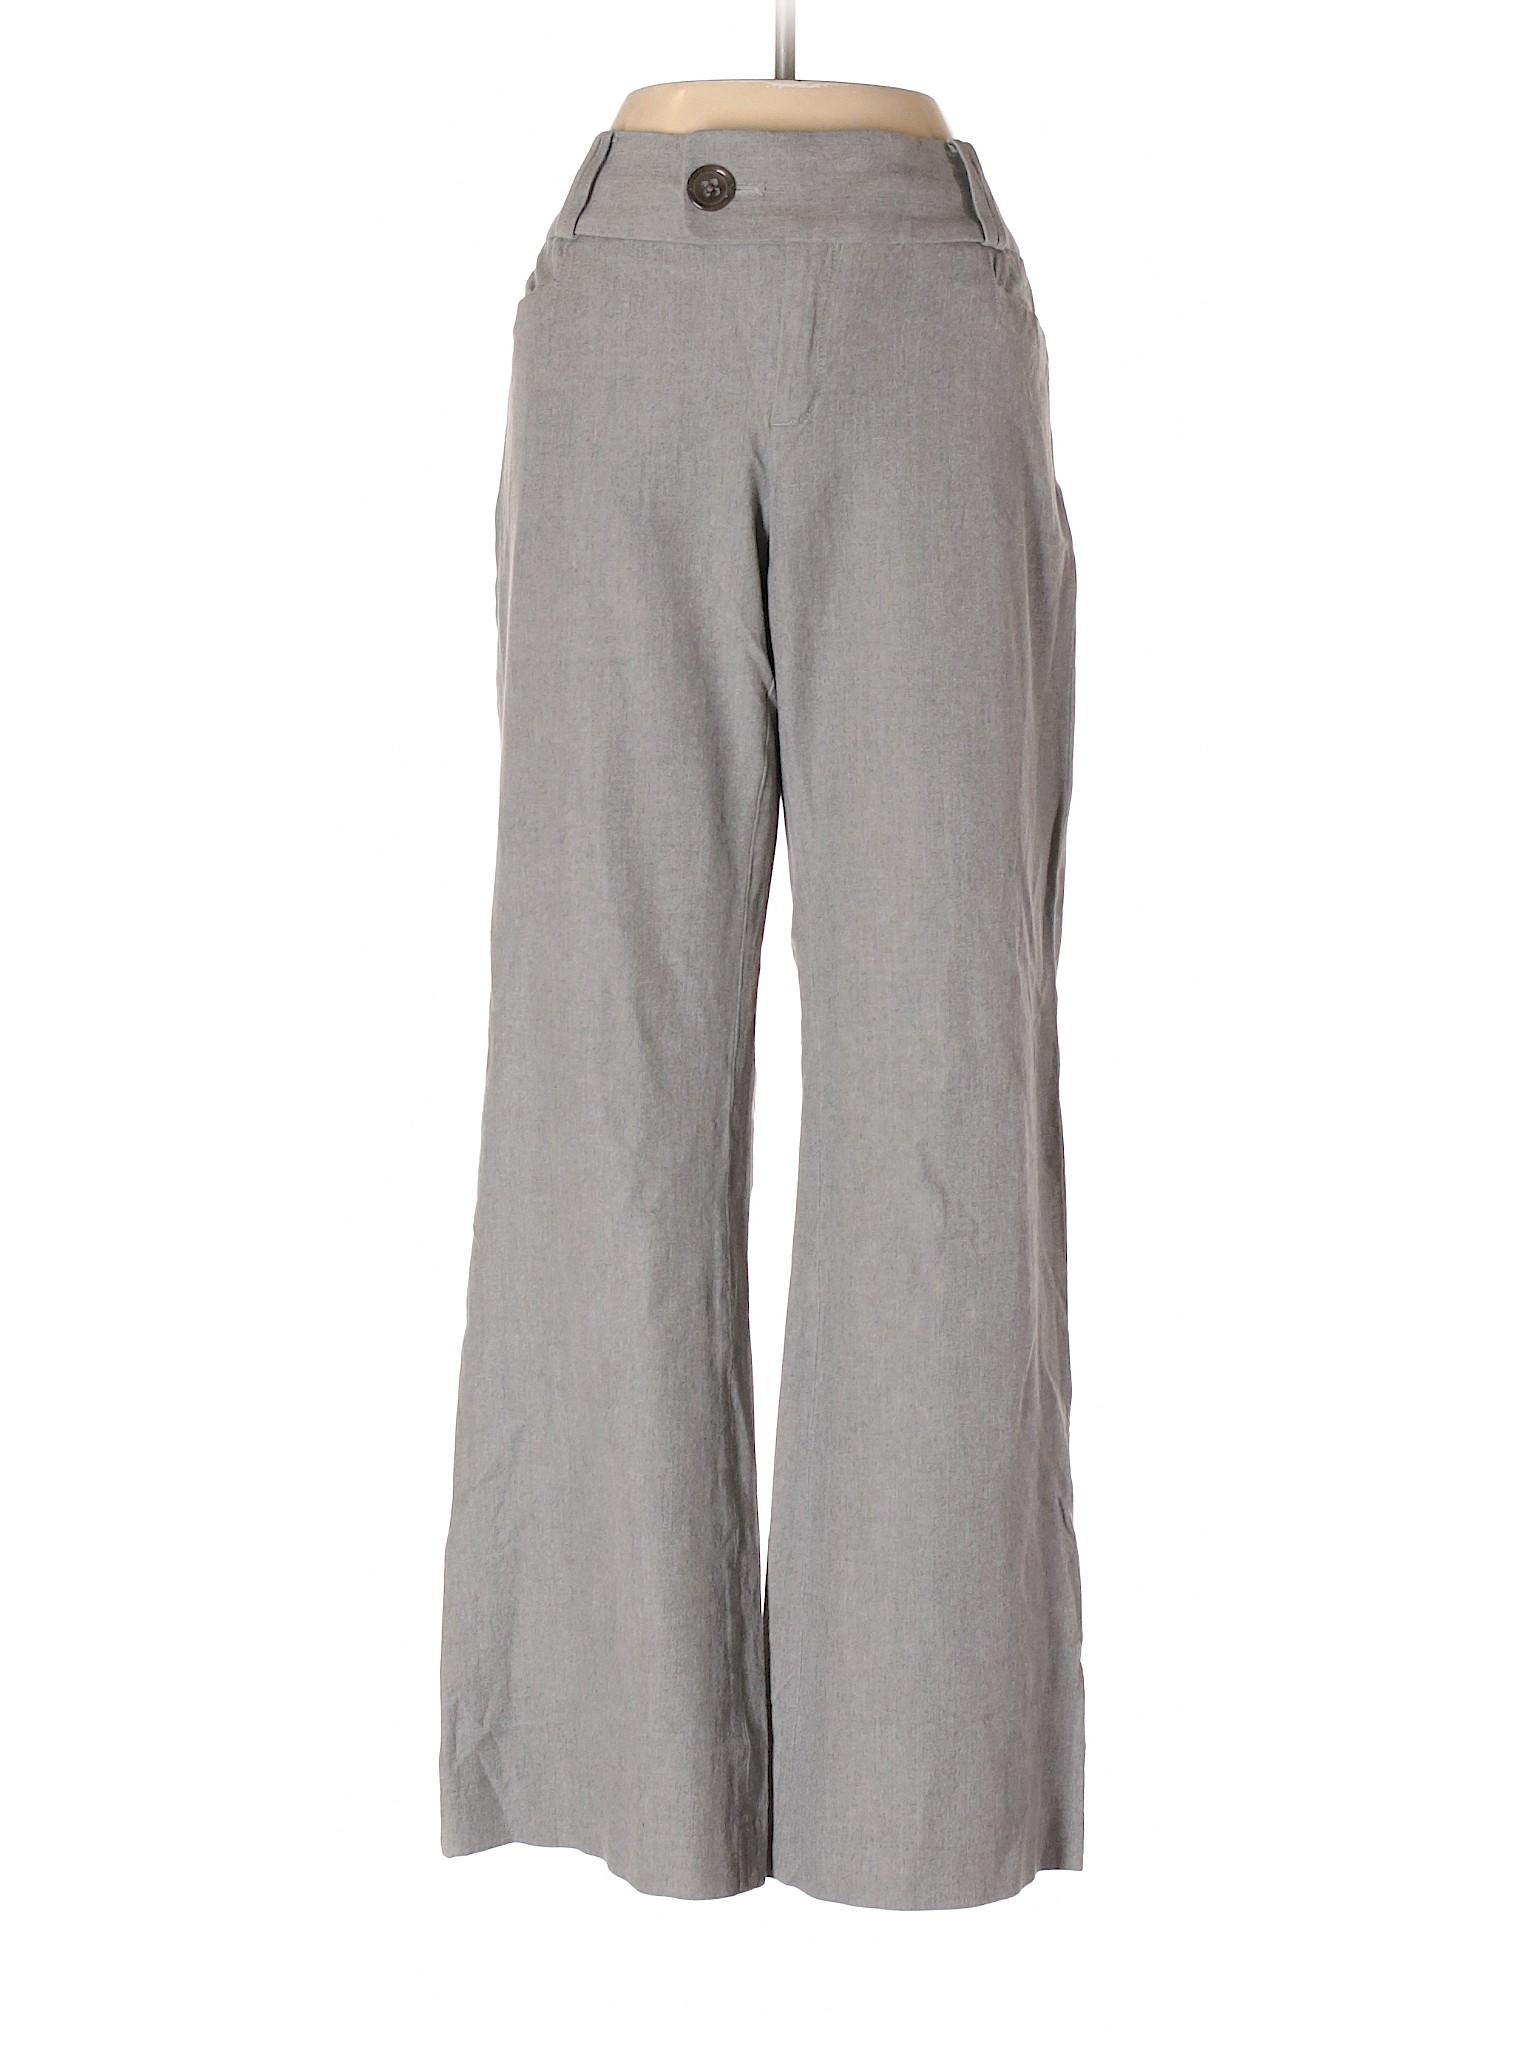 Banana Dress winter Boutique Pants Republic 5HFvPvc